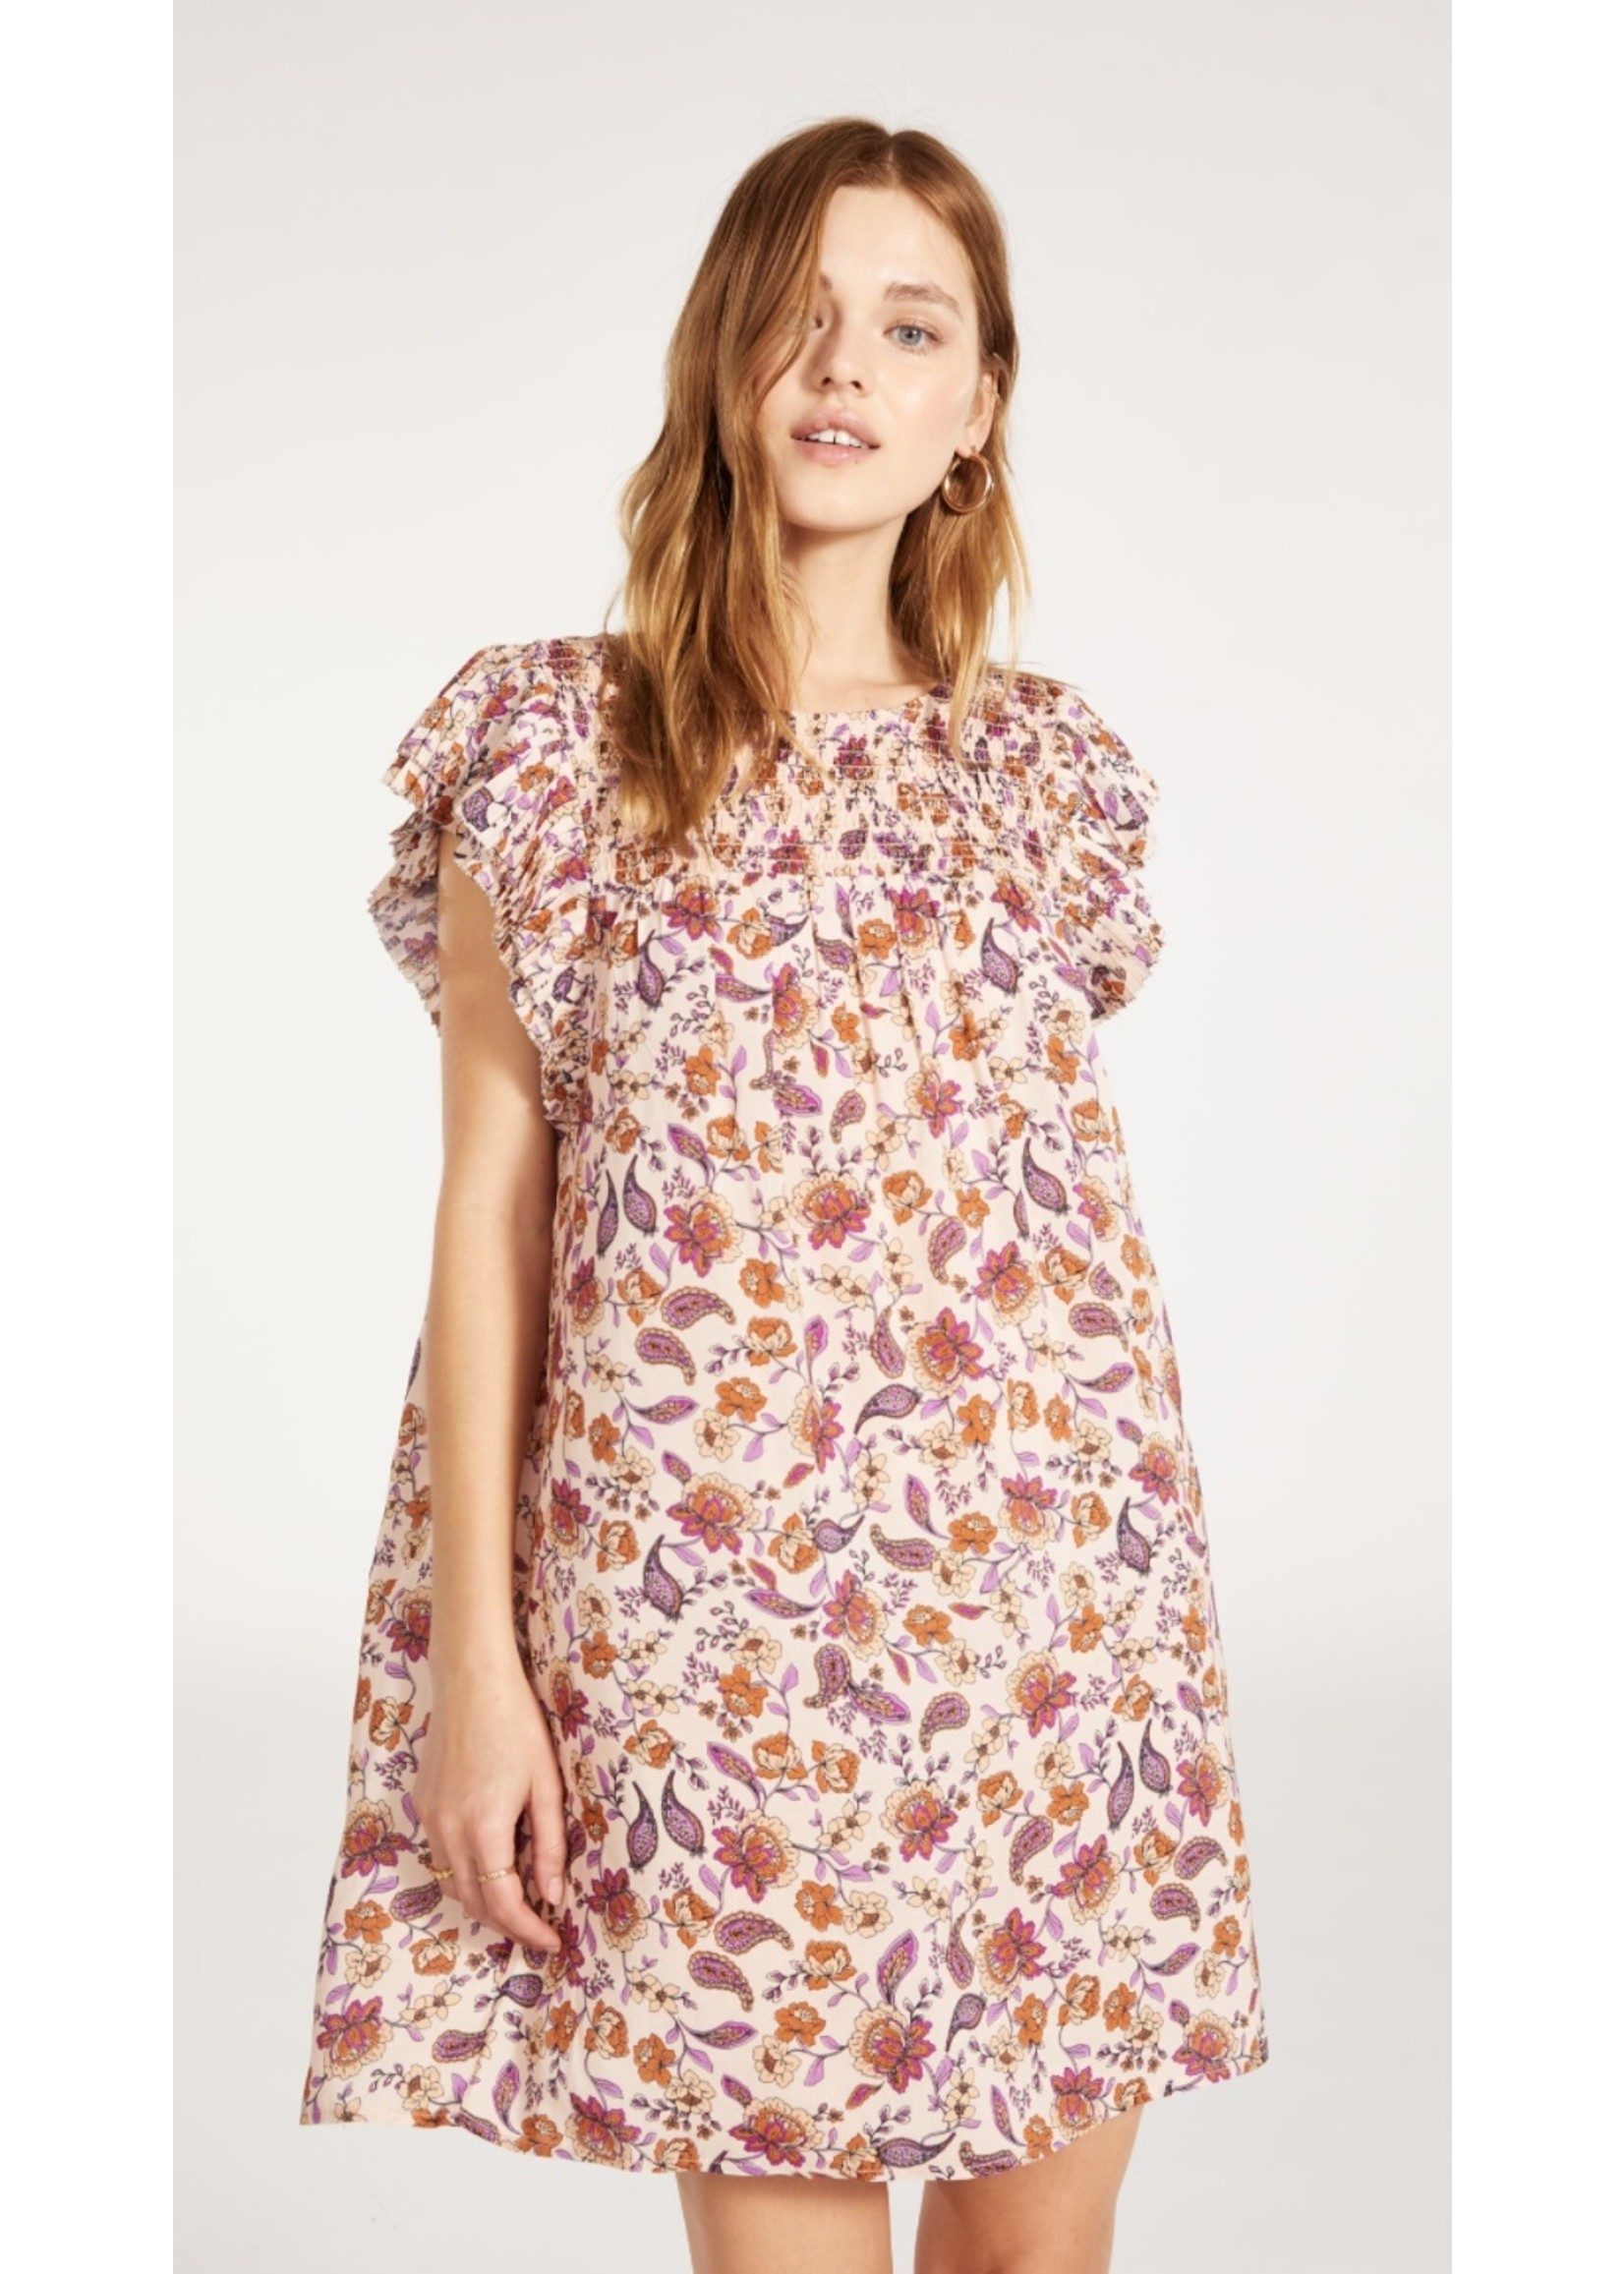 BB Dakota Paisley Attention Dress - BL308255